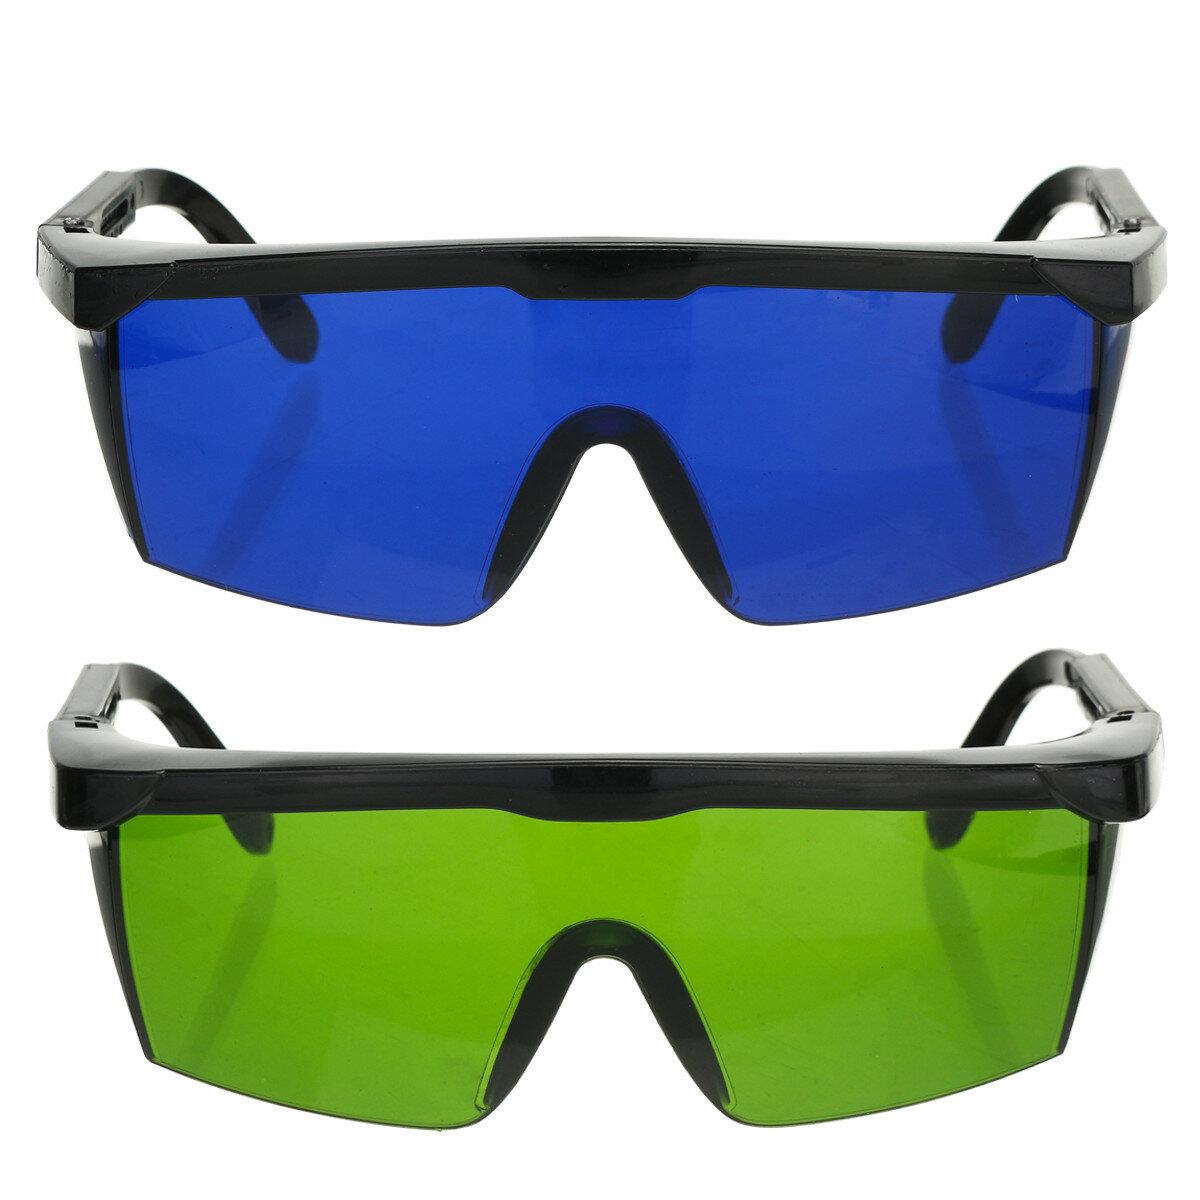 Pro लेजर Protection काले चश्मे Protective सुरक्षा चश्मा IPL OD + 4D 190nm-2000nm लेजर चश्मे